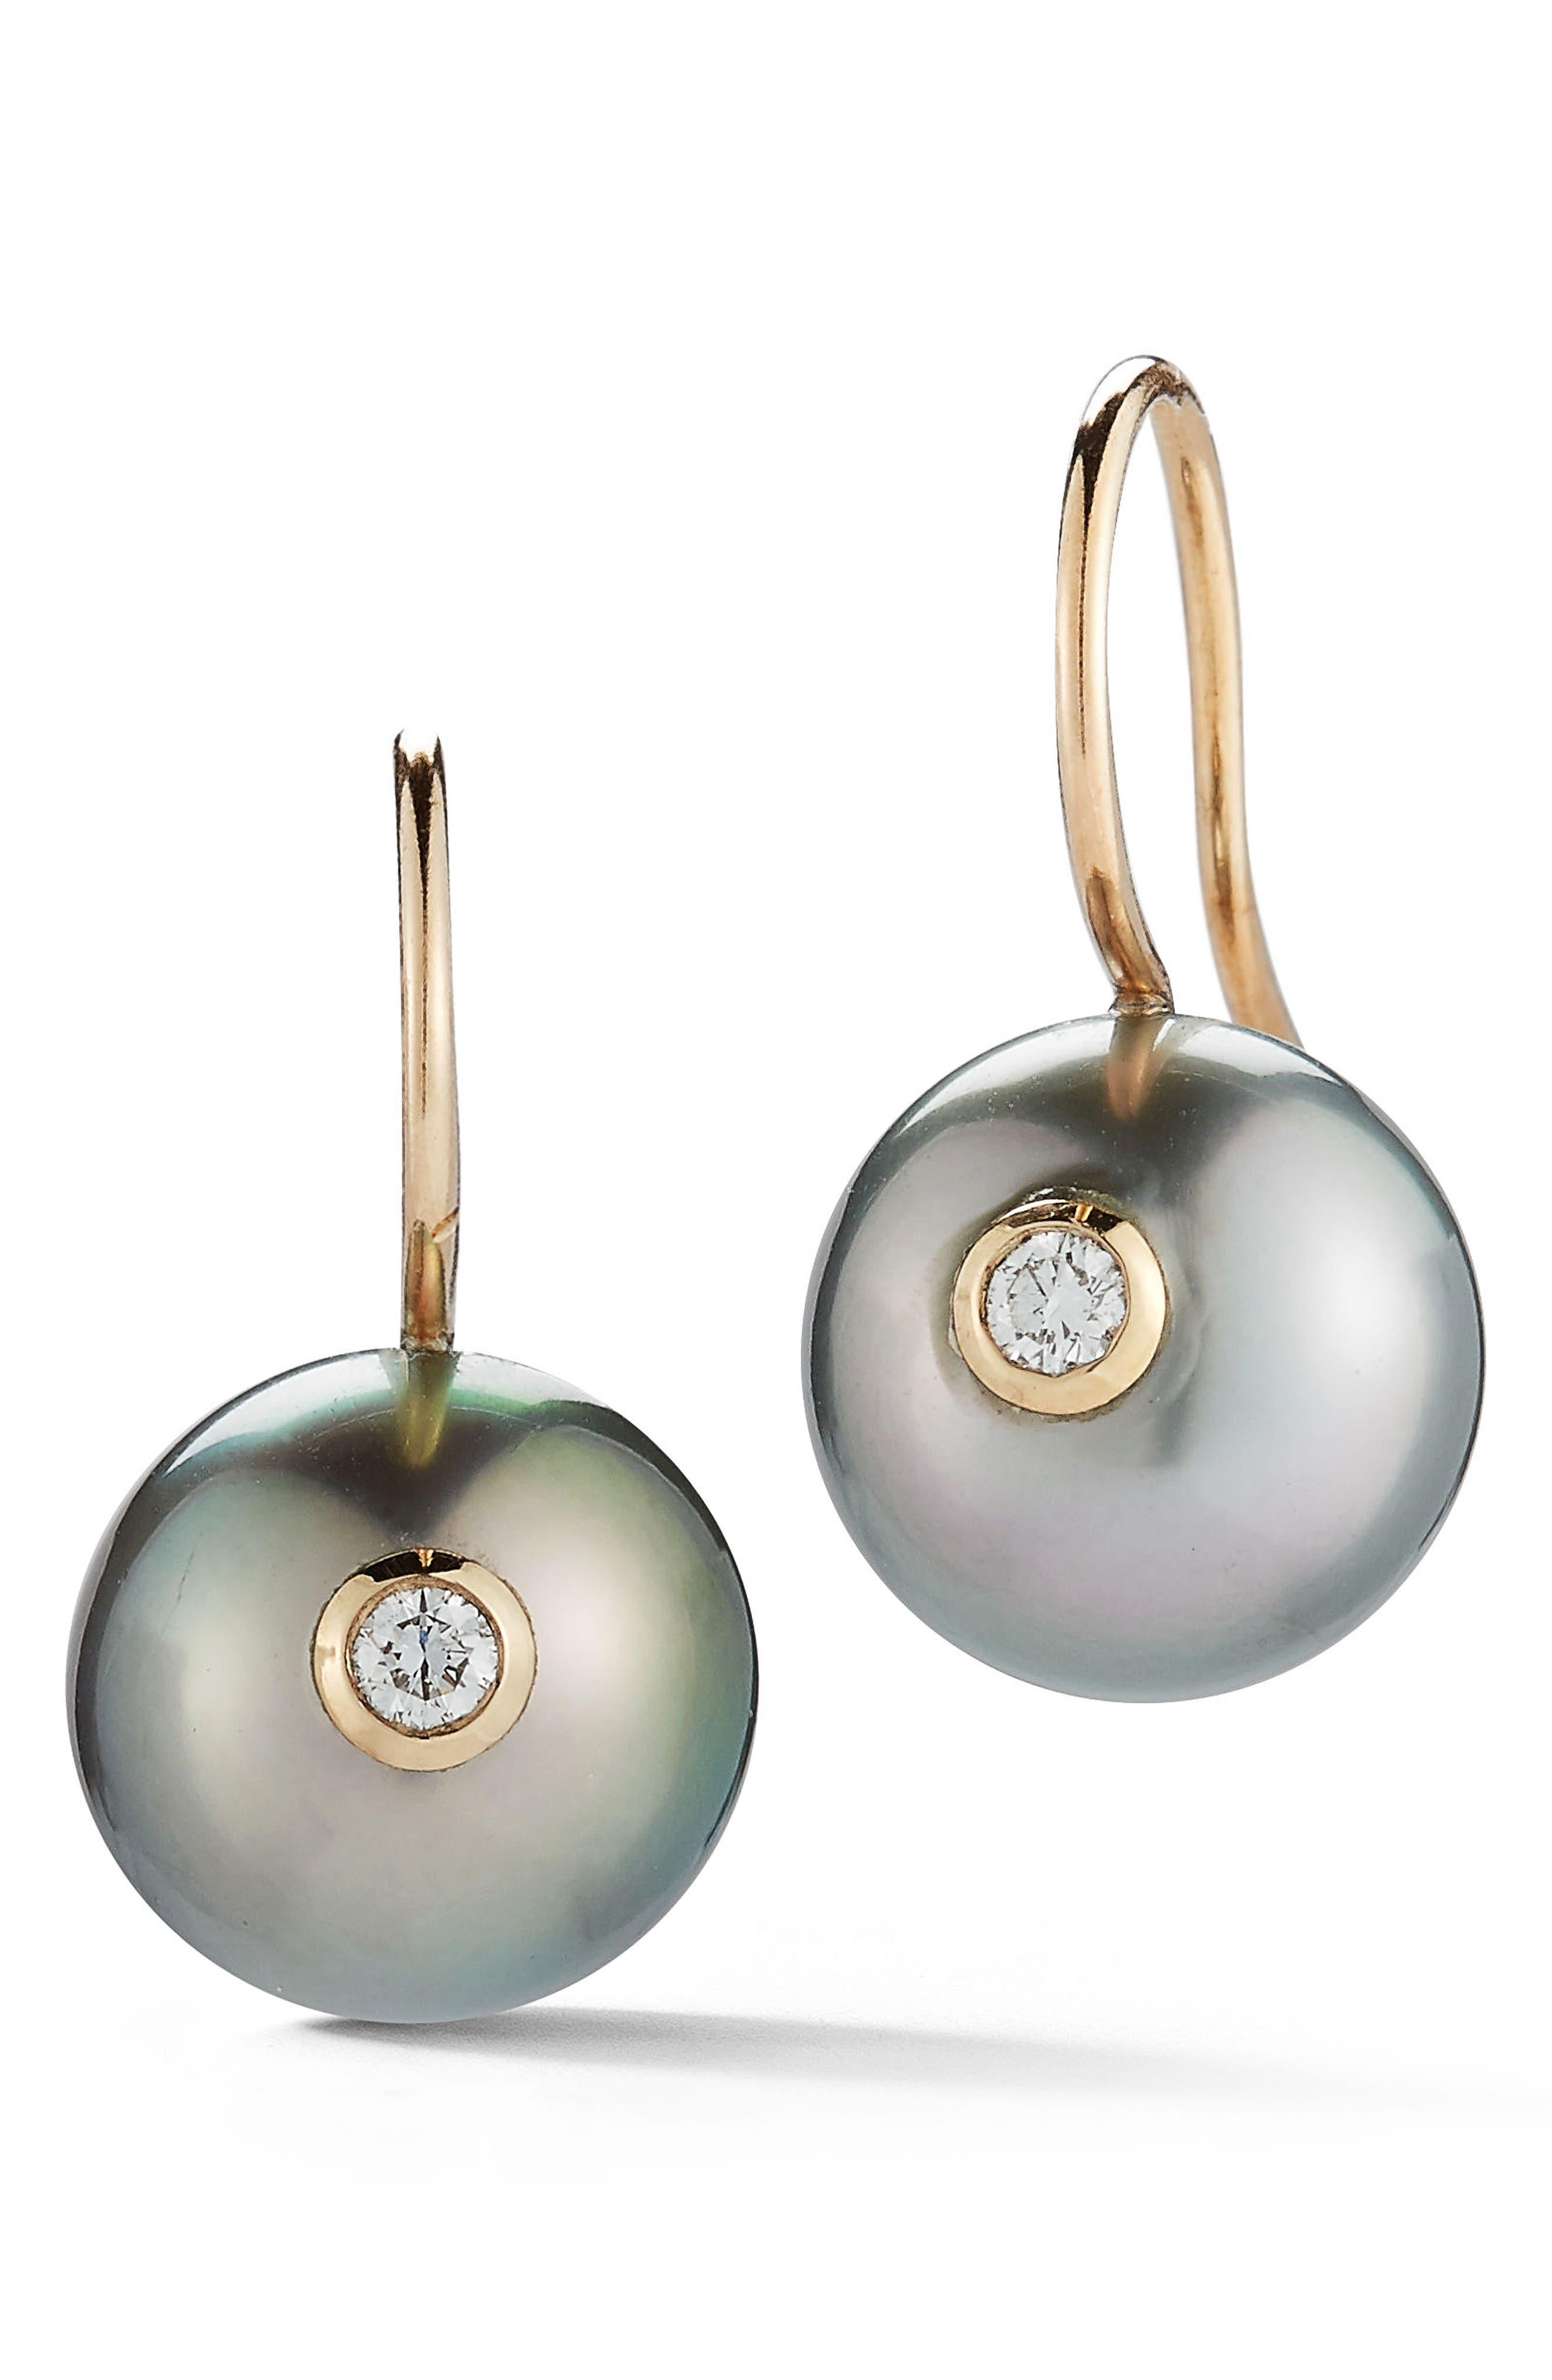 Black Pearl & Diamond Drop Earrings,                             Main thumbnail 1, color,                             YELLOW GOLD